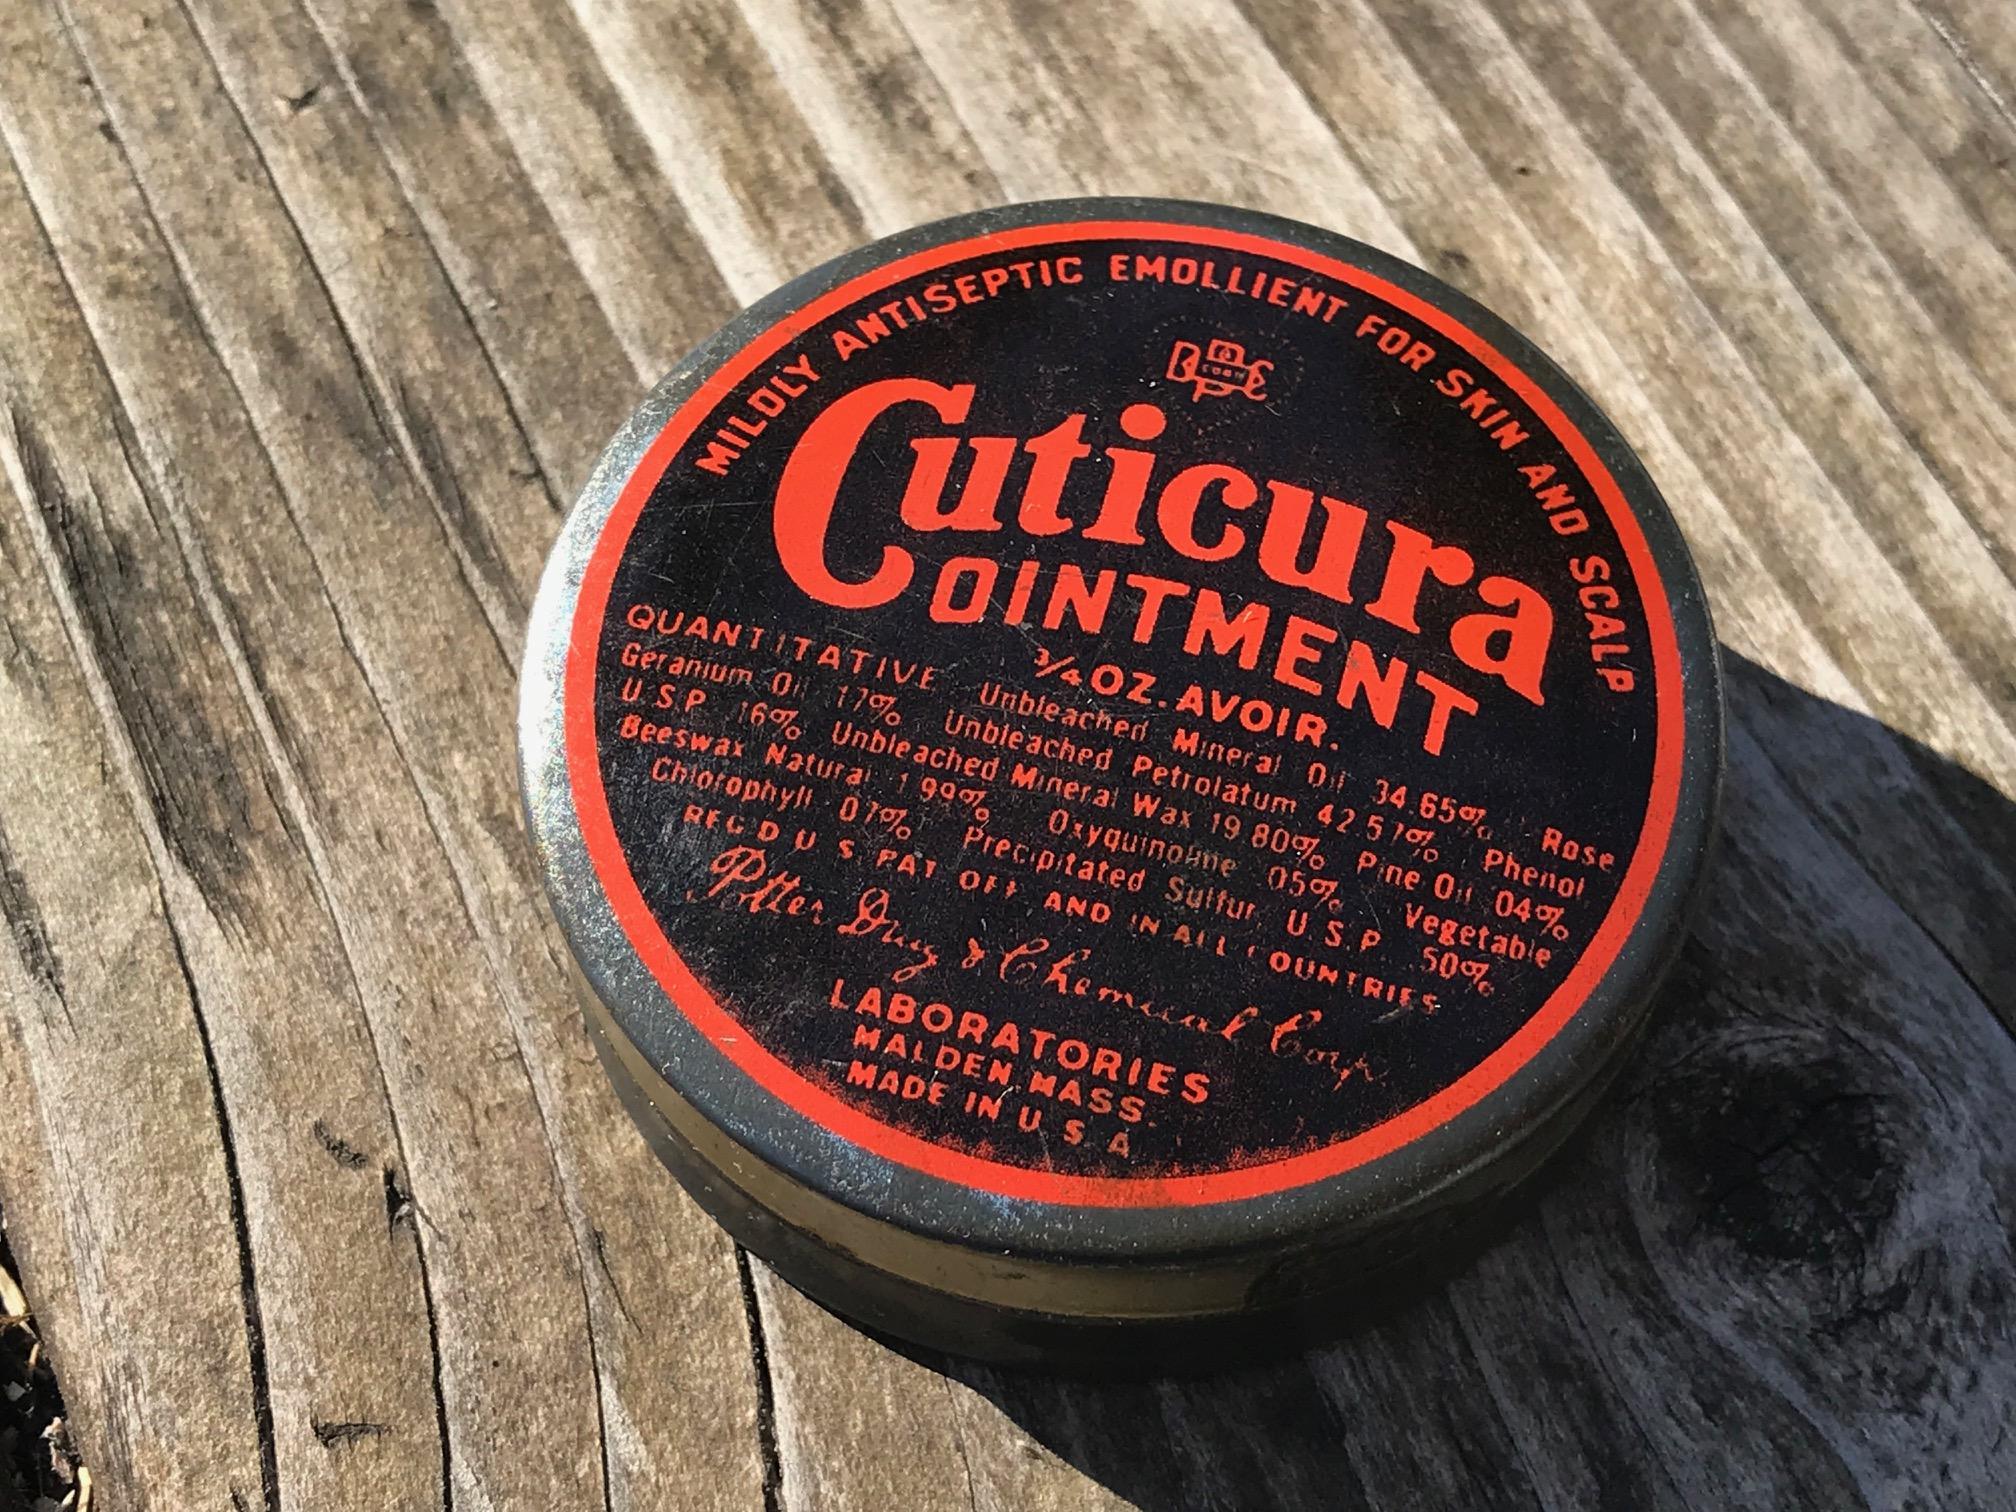 Vintage Tin, Cuticura Ointment: 24,000 ppm Lead + 209 ppm Cadmium.